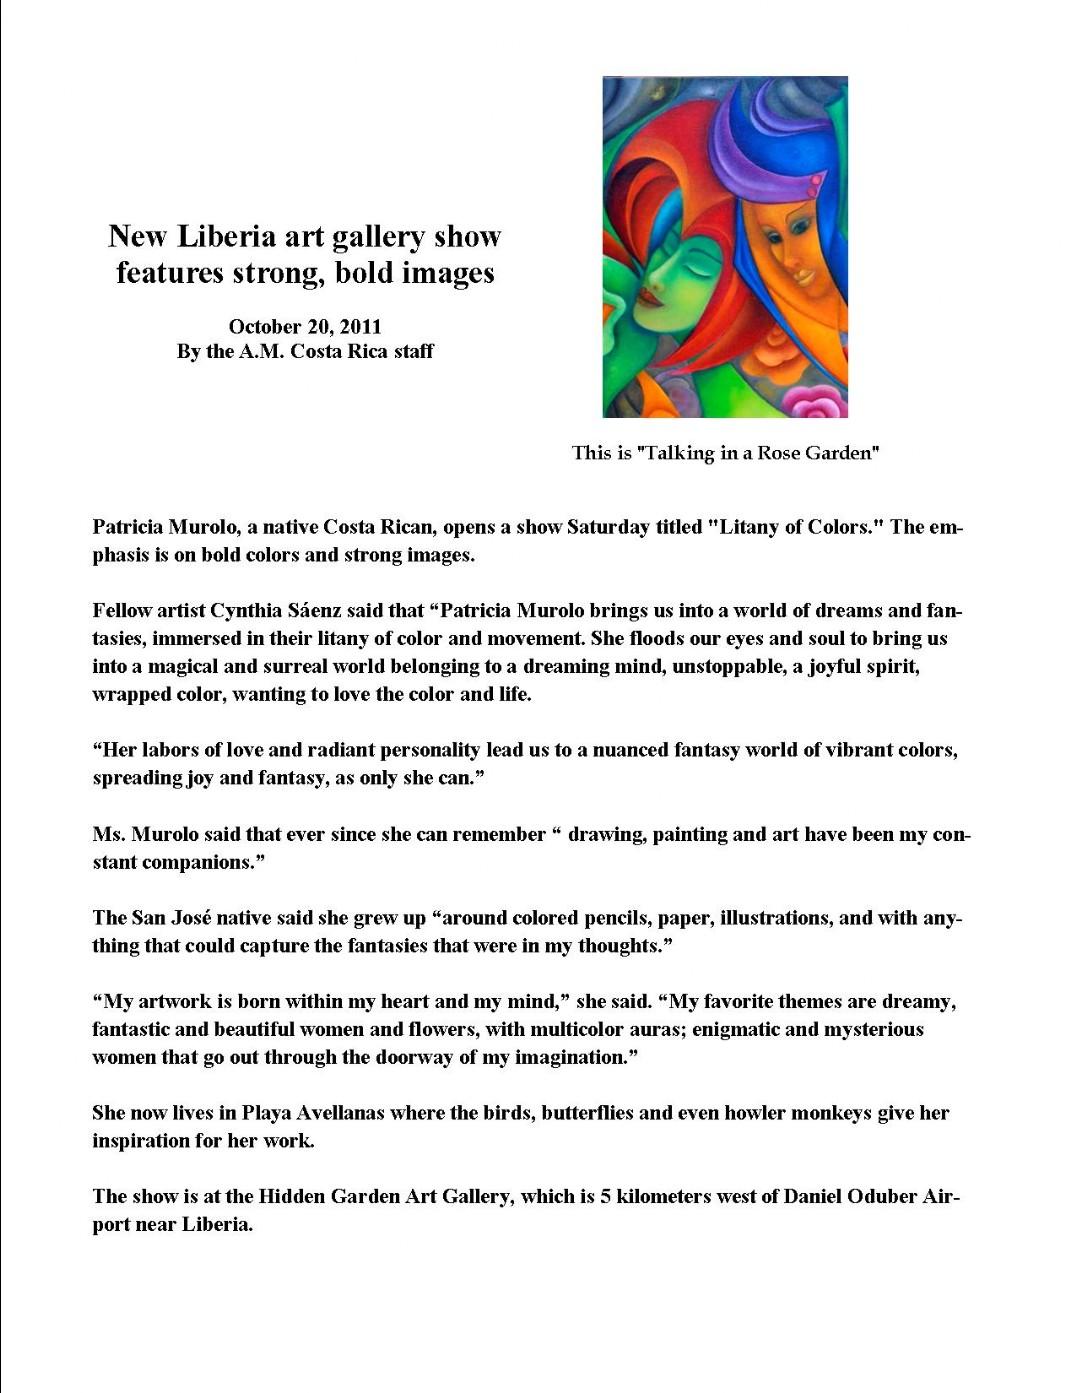 October 20, 2011: Patricia Murolu - Hidden Garden Art